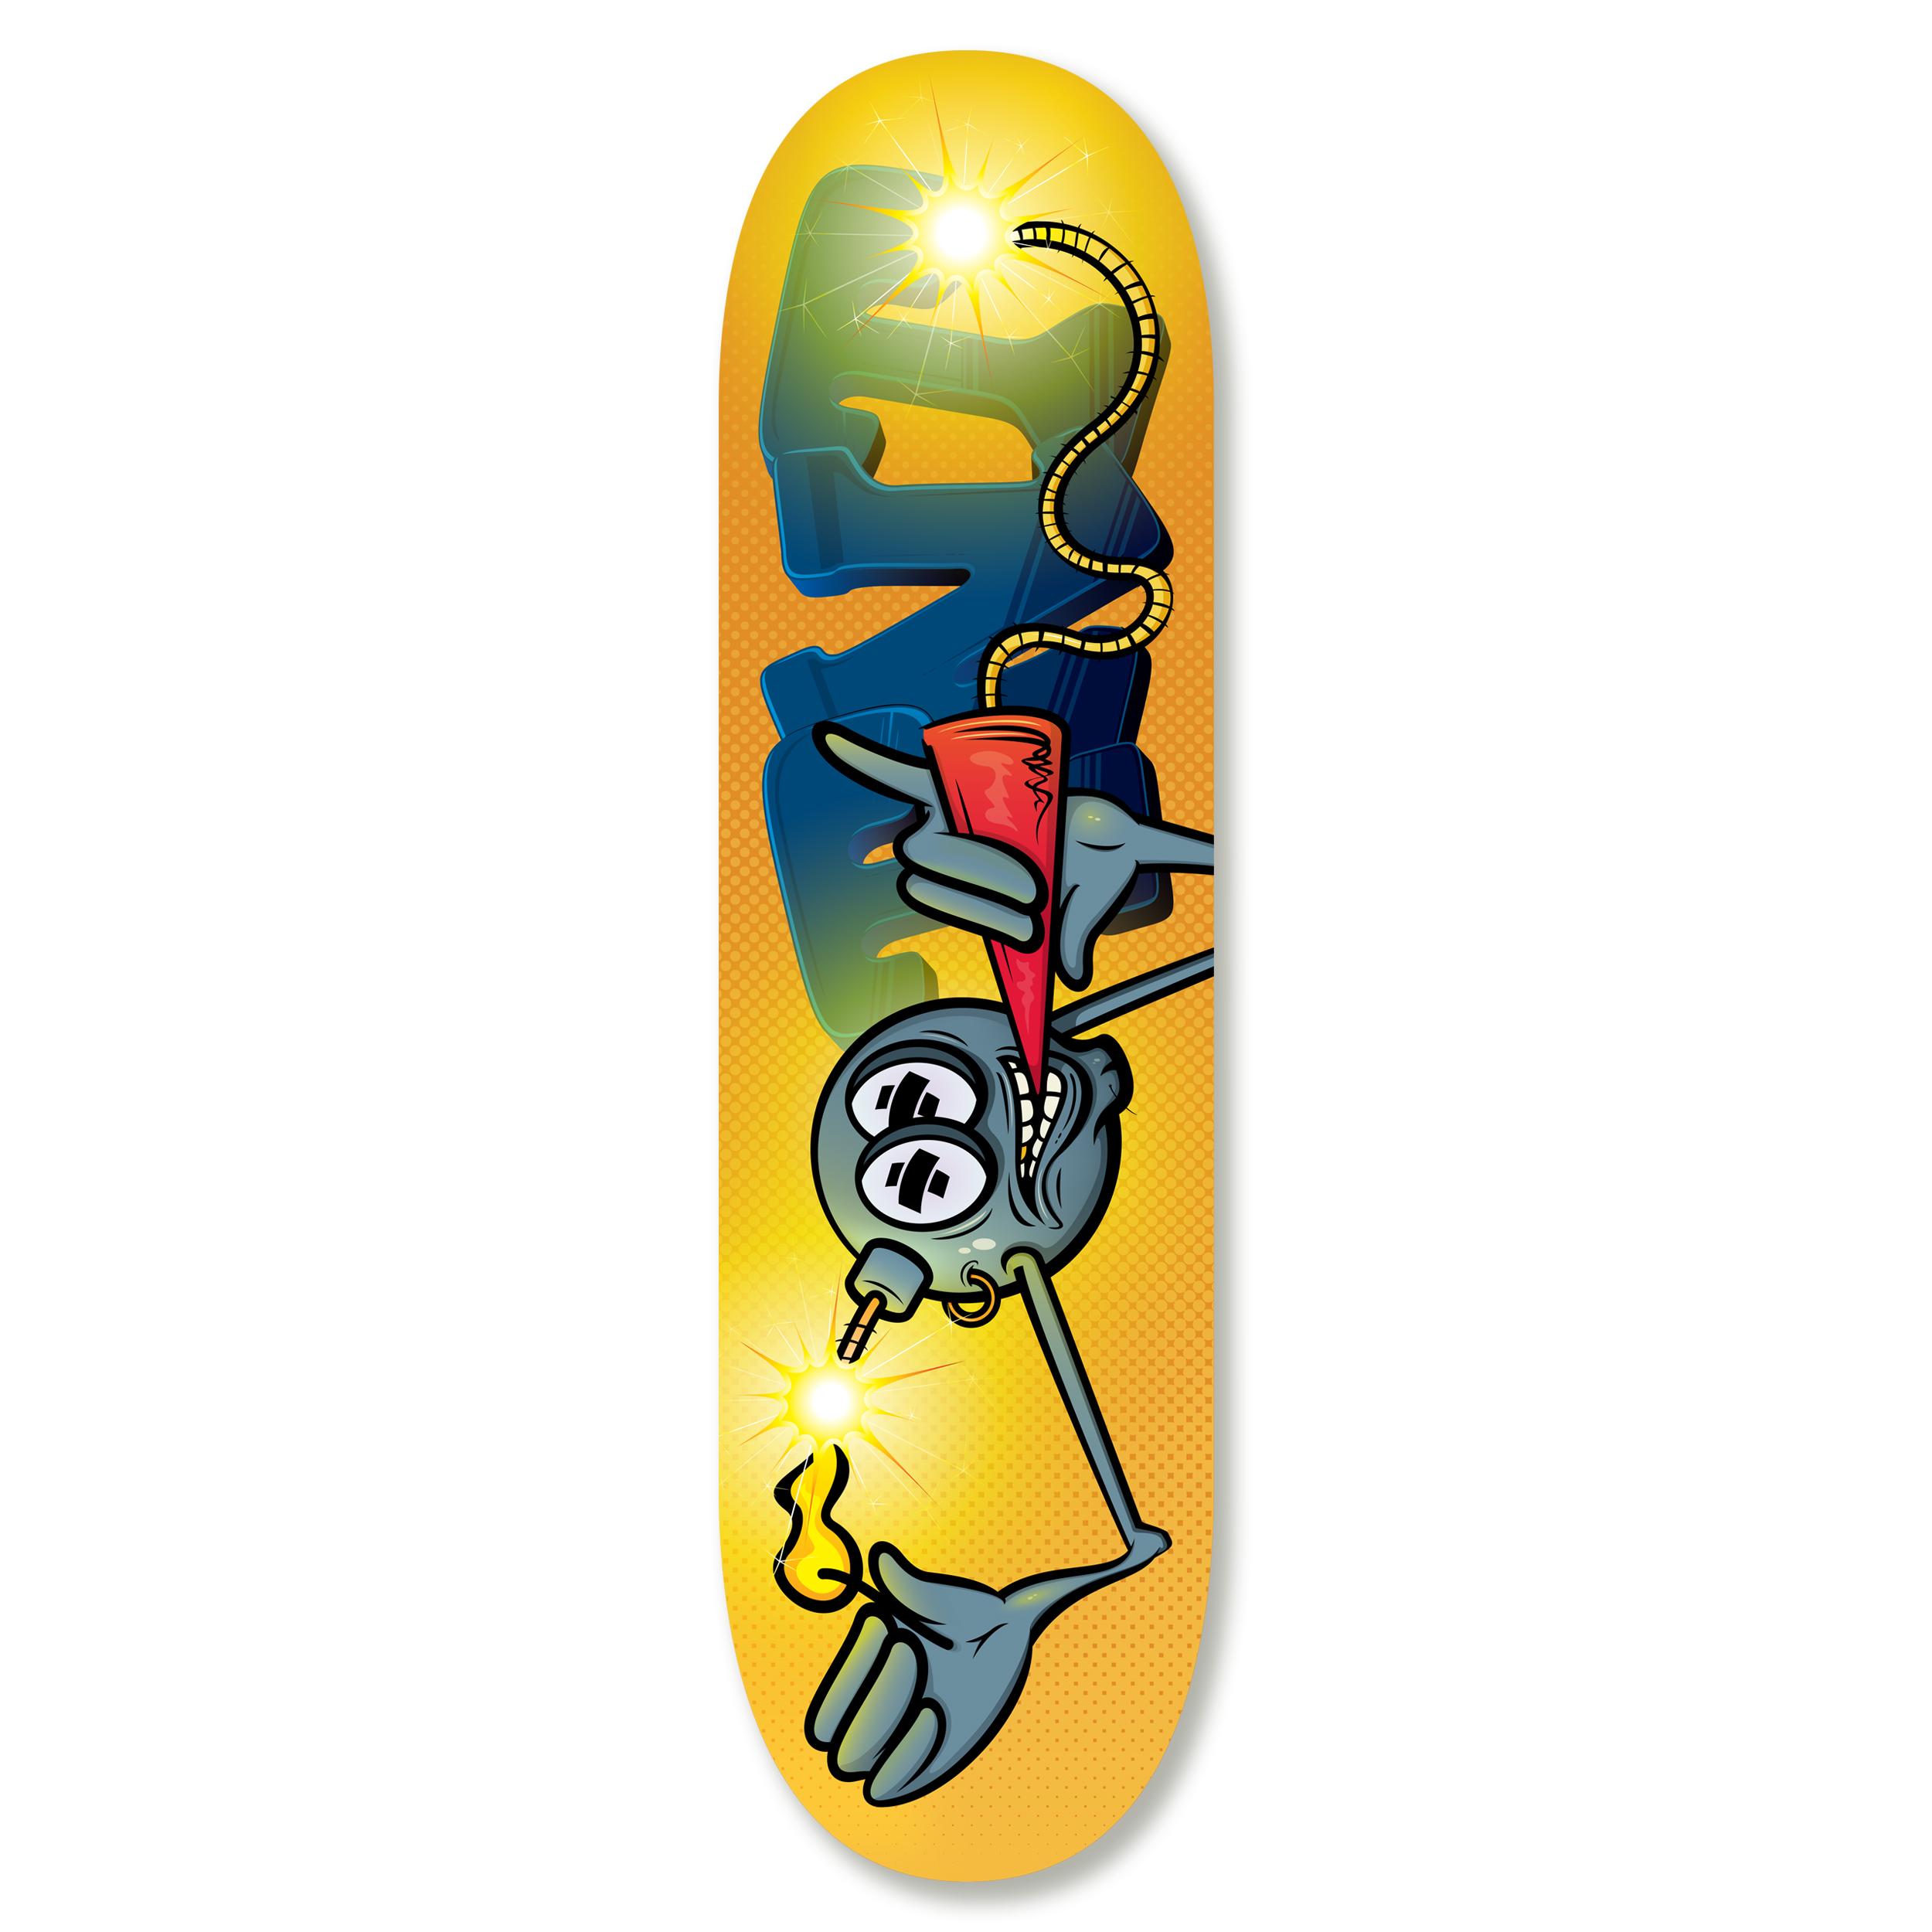 skateboard-deck-smokin-dynamite-02.jpg